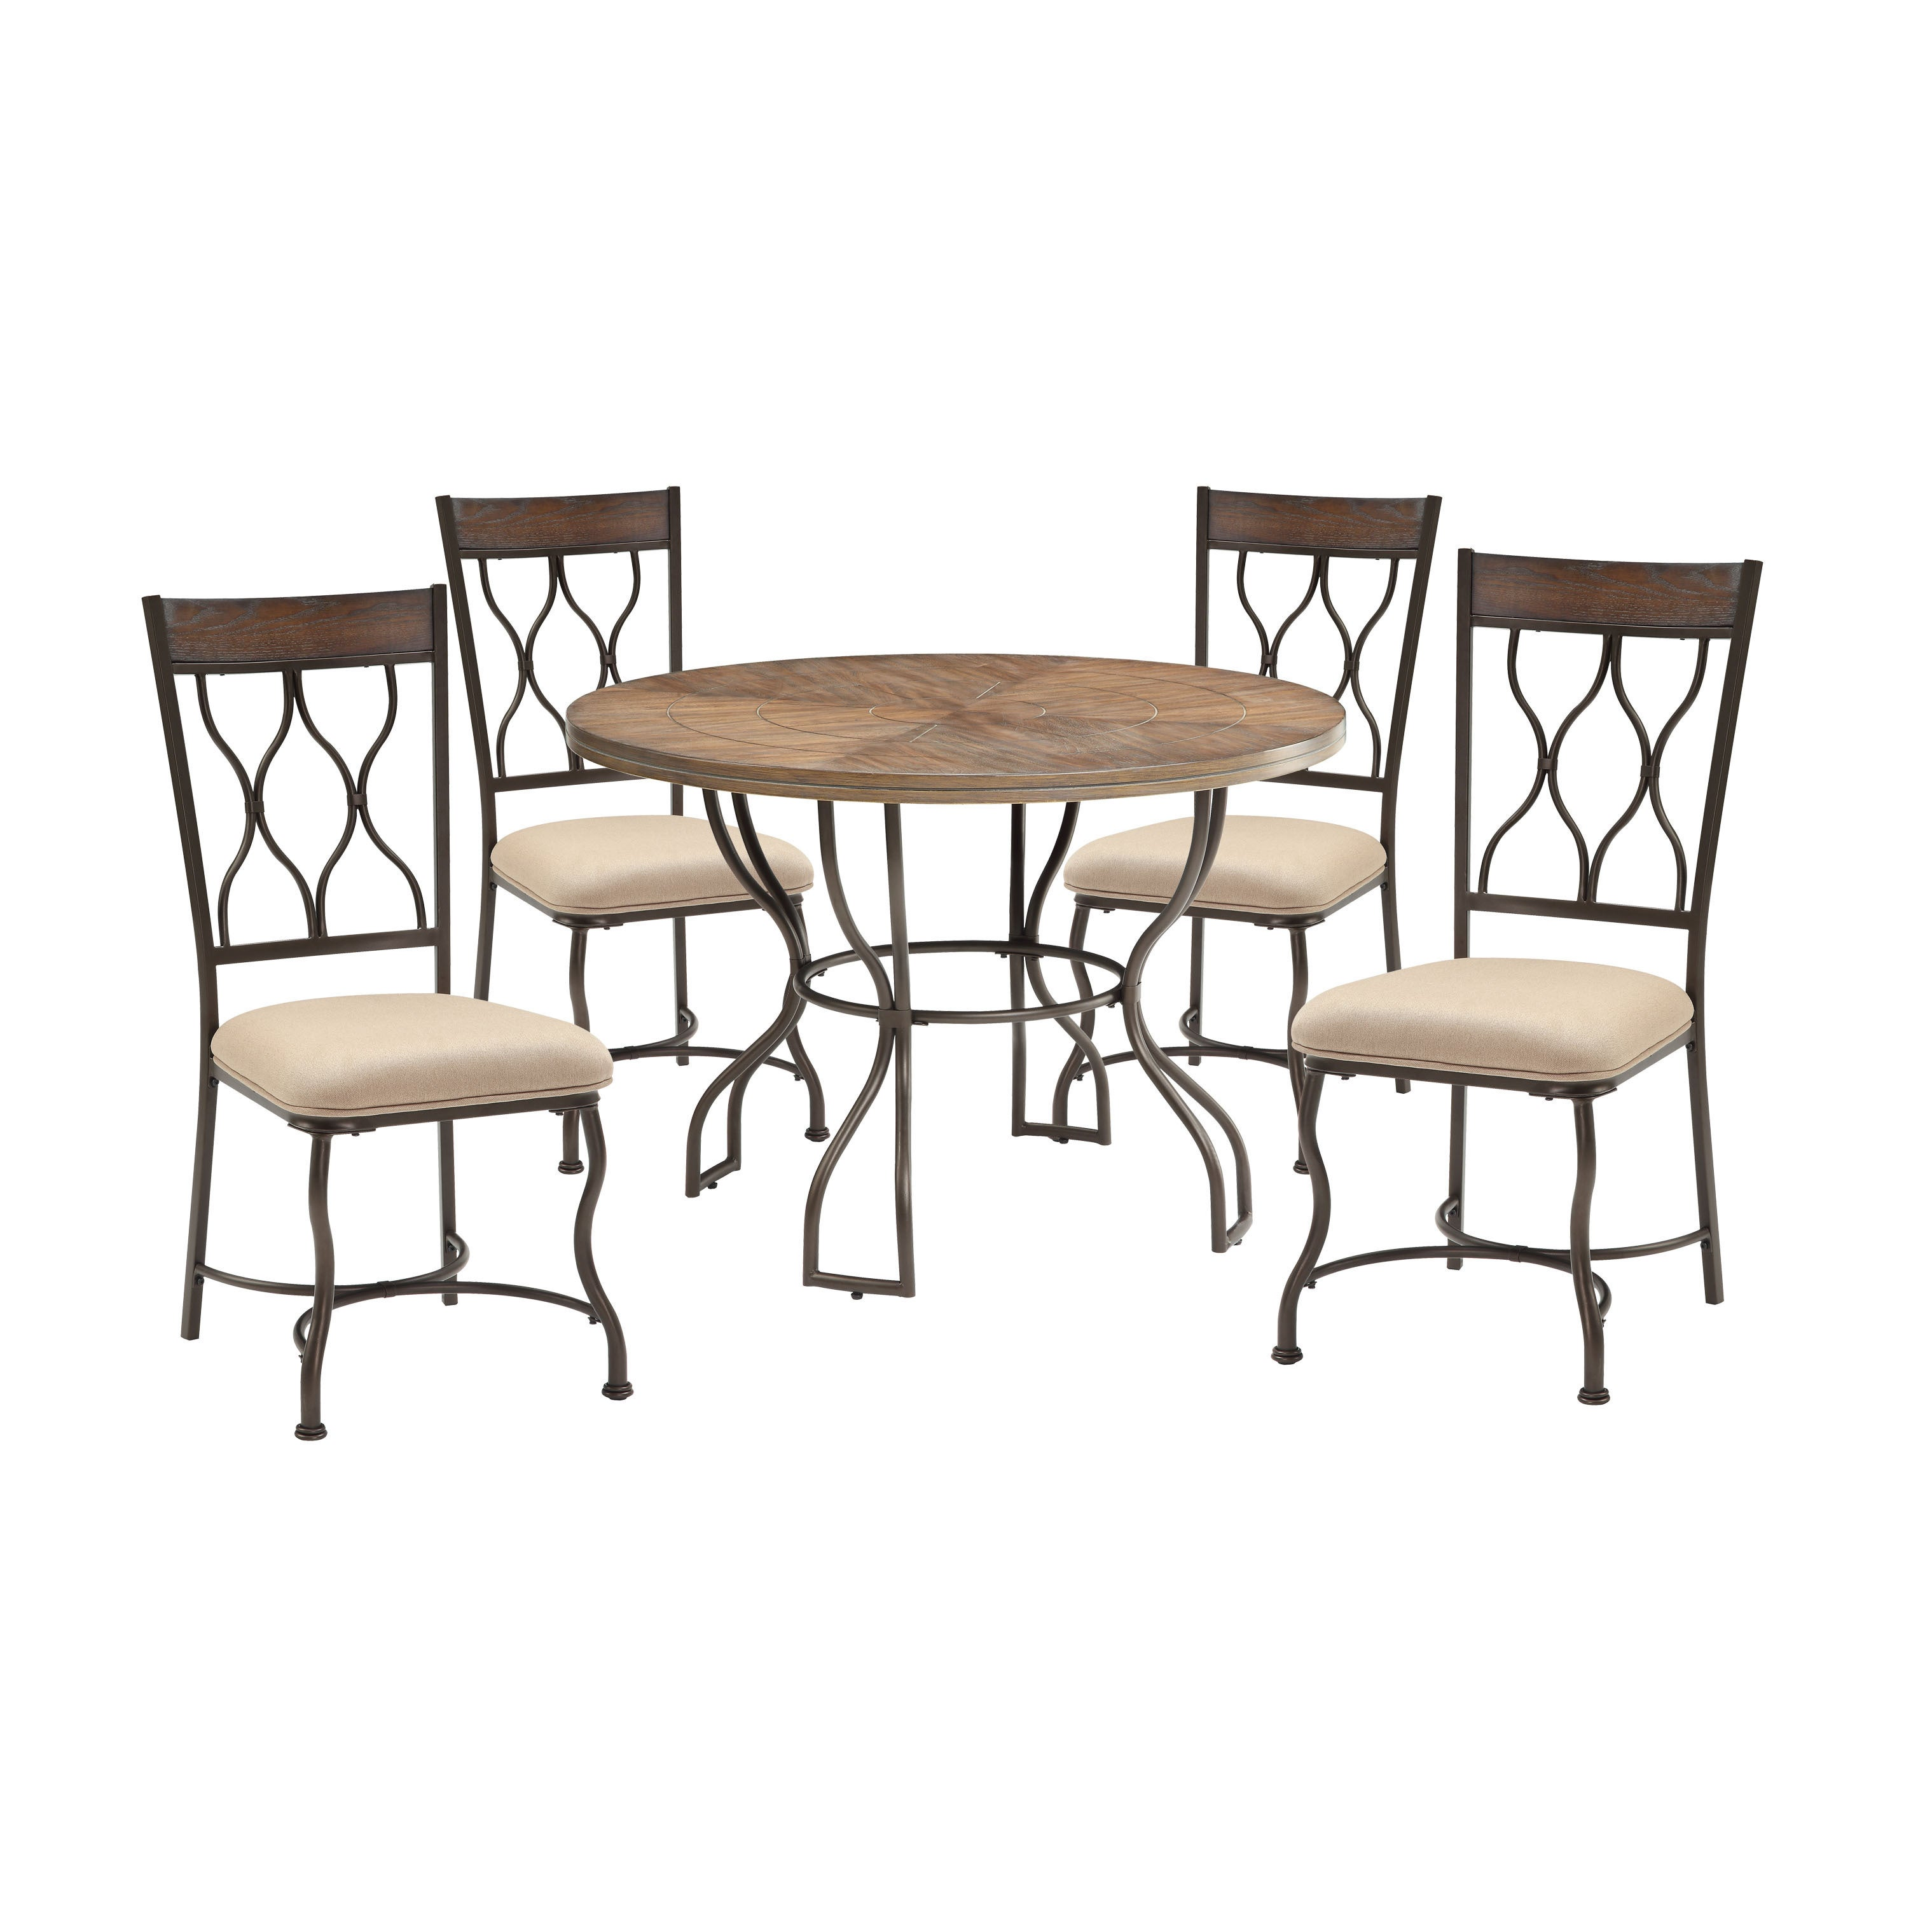 ACME Furniture Hansa 5-Piece Dining Set, Oak and Antique ...